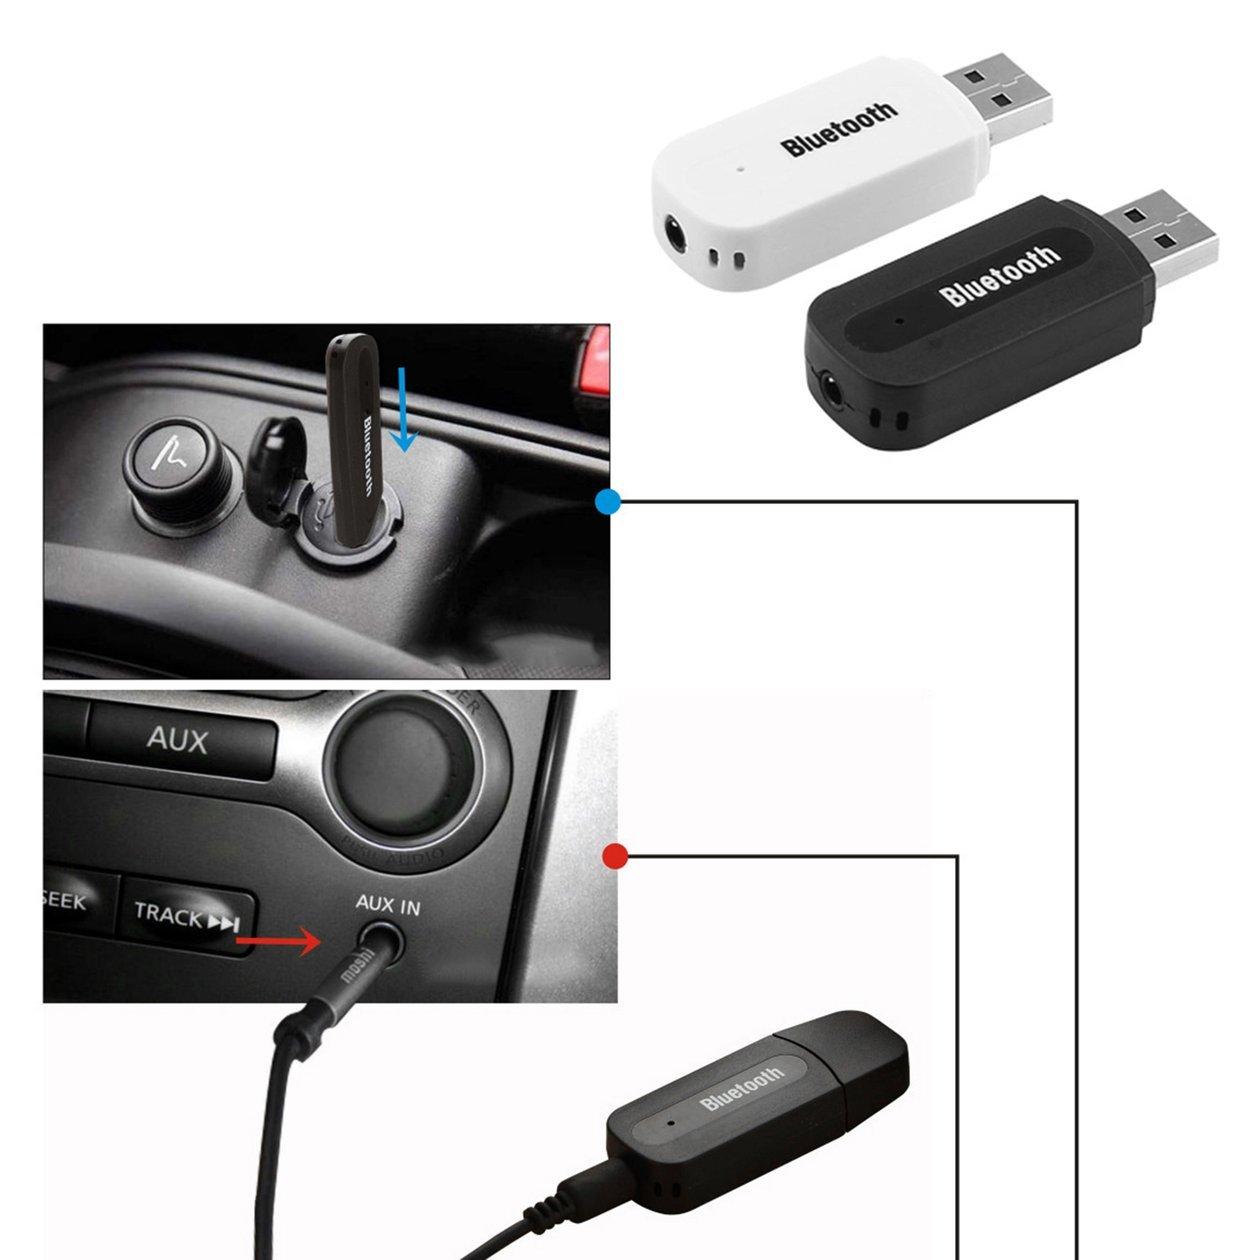 USB Car Bluetooth Adapter 3.5mm Jack Bluetooth Receiver Wireless Bluetooth AUX Audio MP3 Music Player Handsfree Car Tool